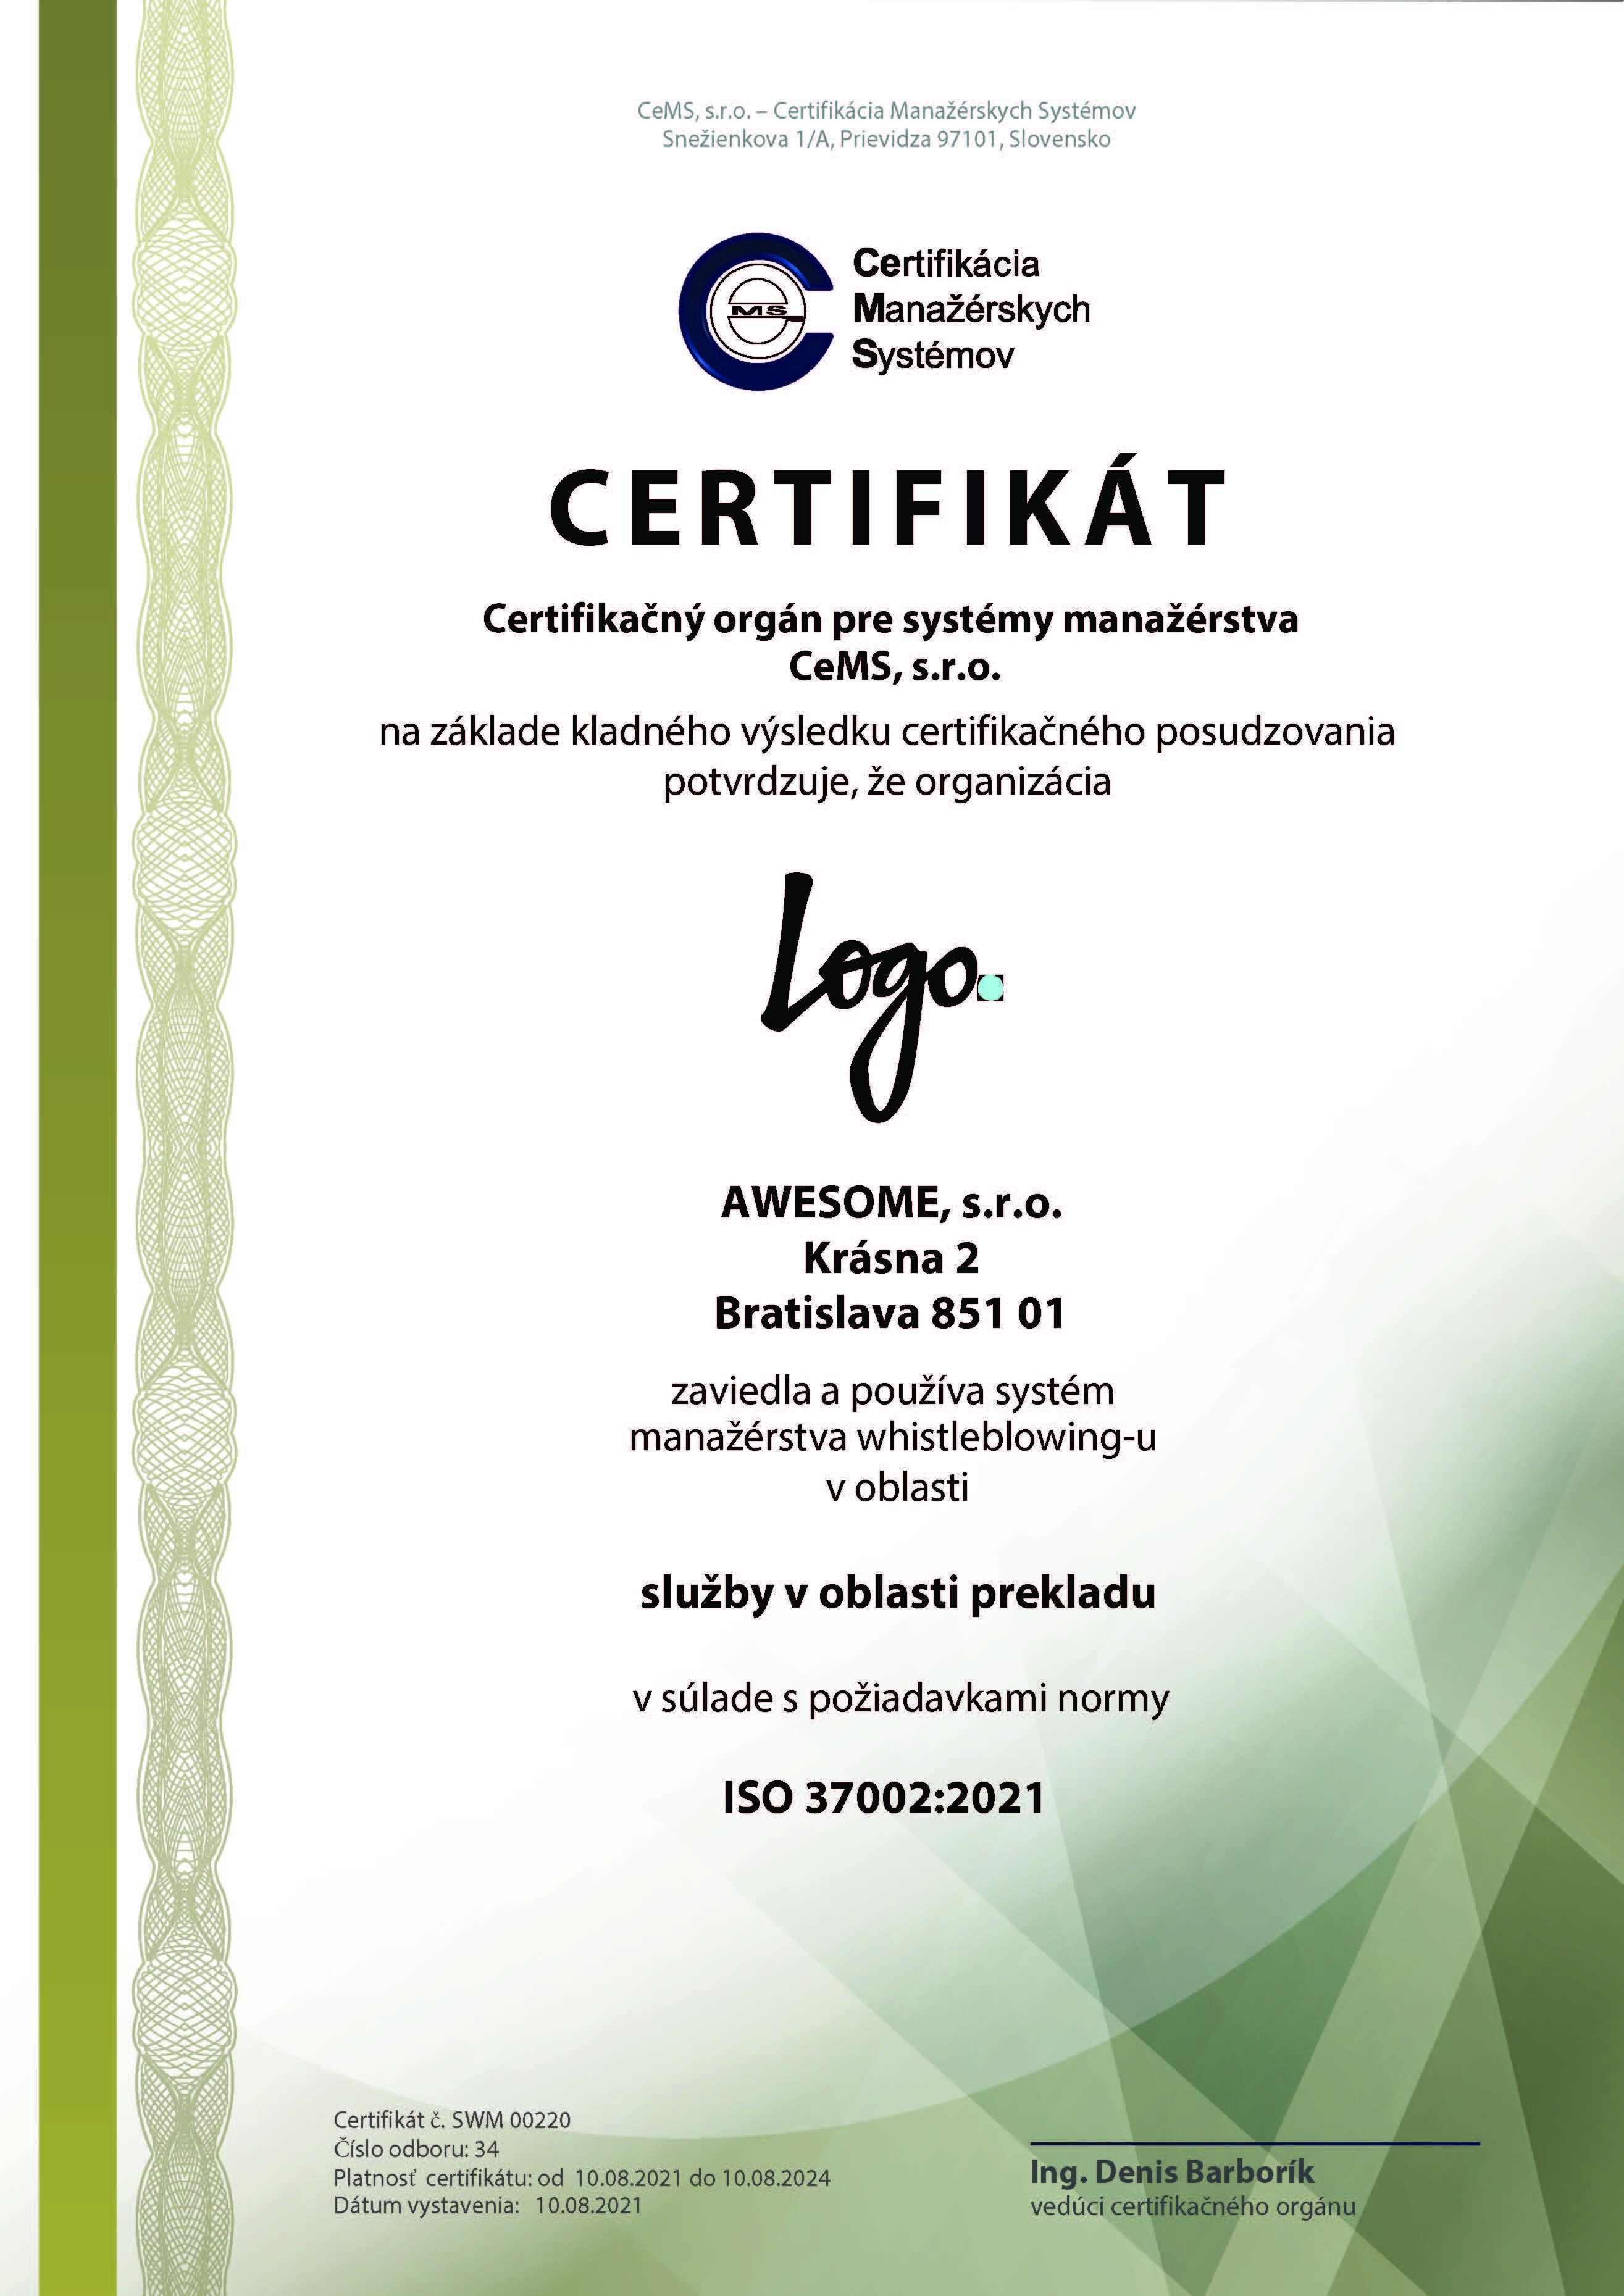 vzor certifikátu ISO 37002 od CeMS